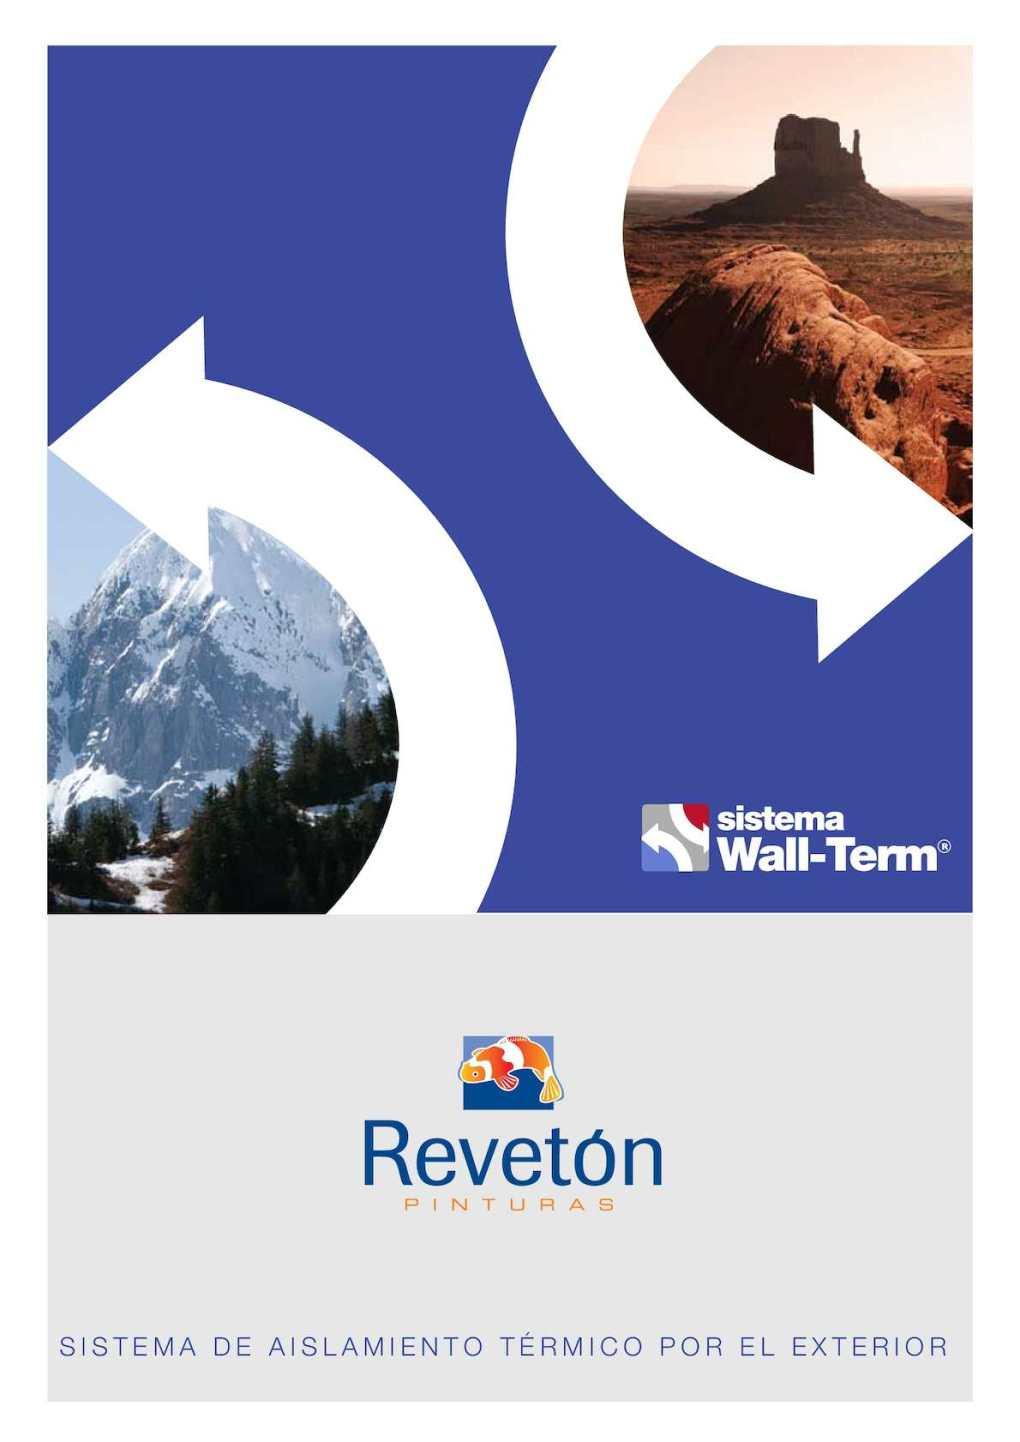 Wall-Term